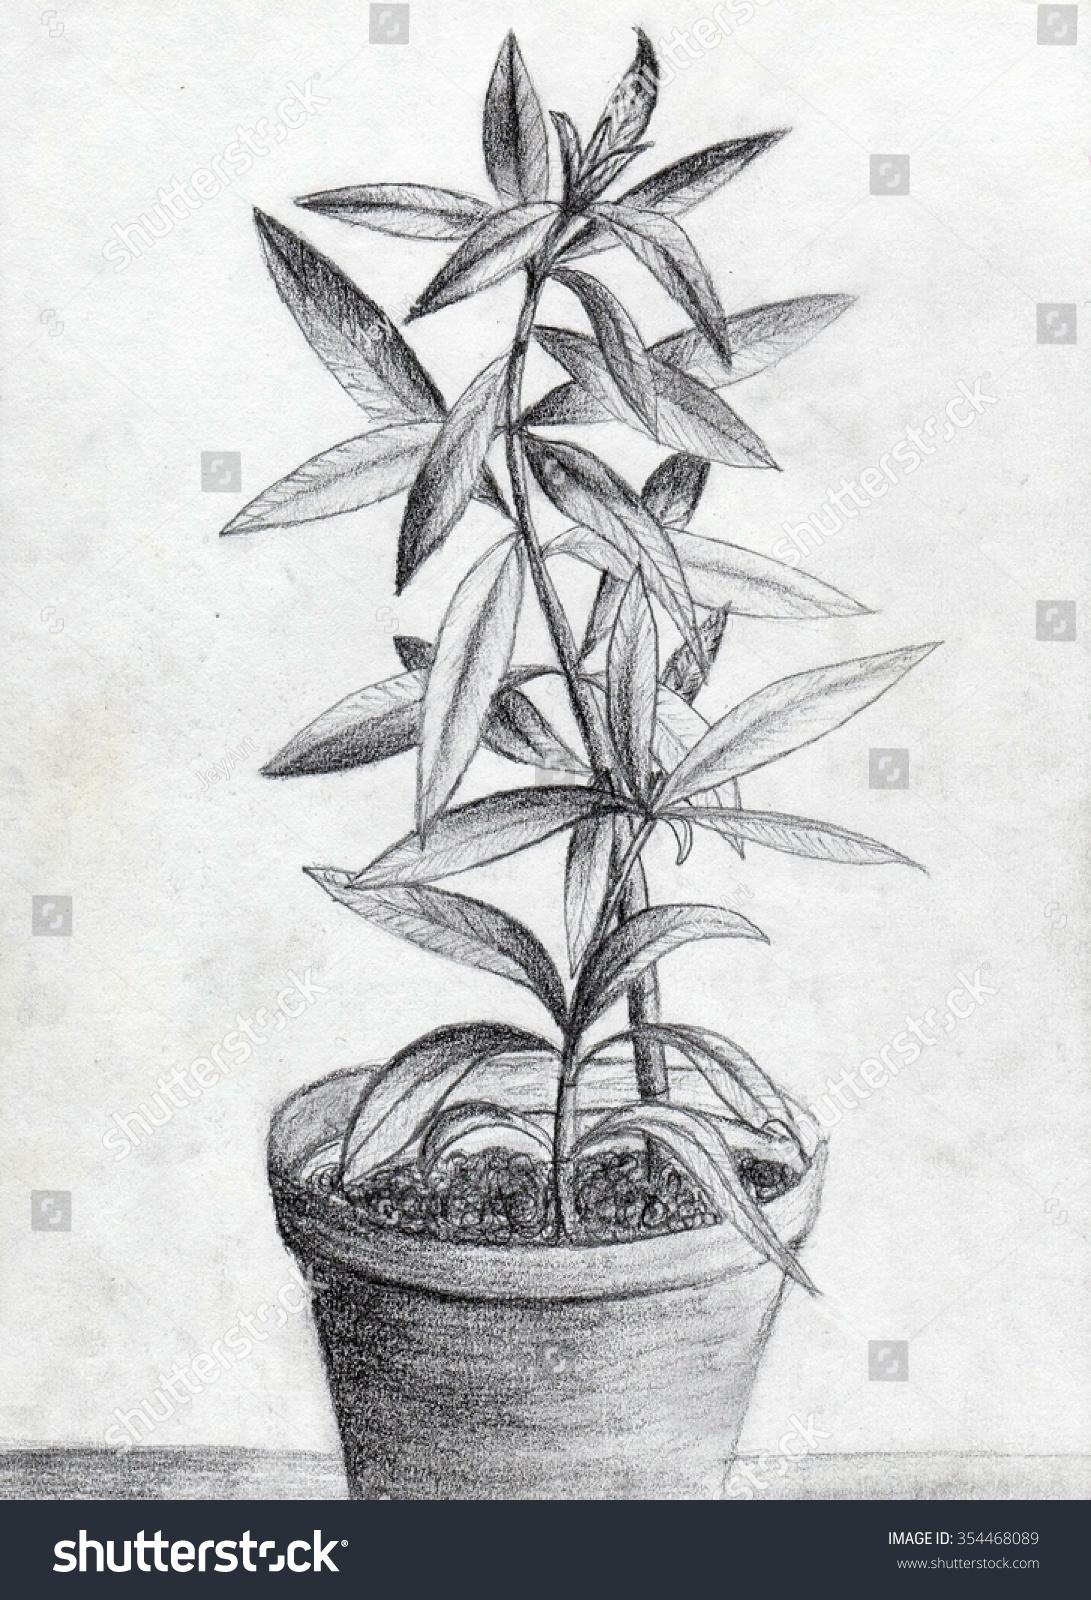 Pencil drawing plant flower pot stock illustration 354468089